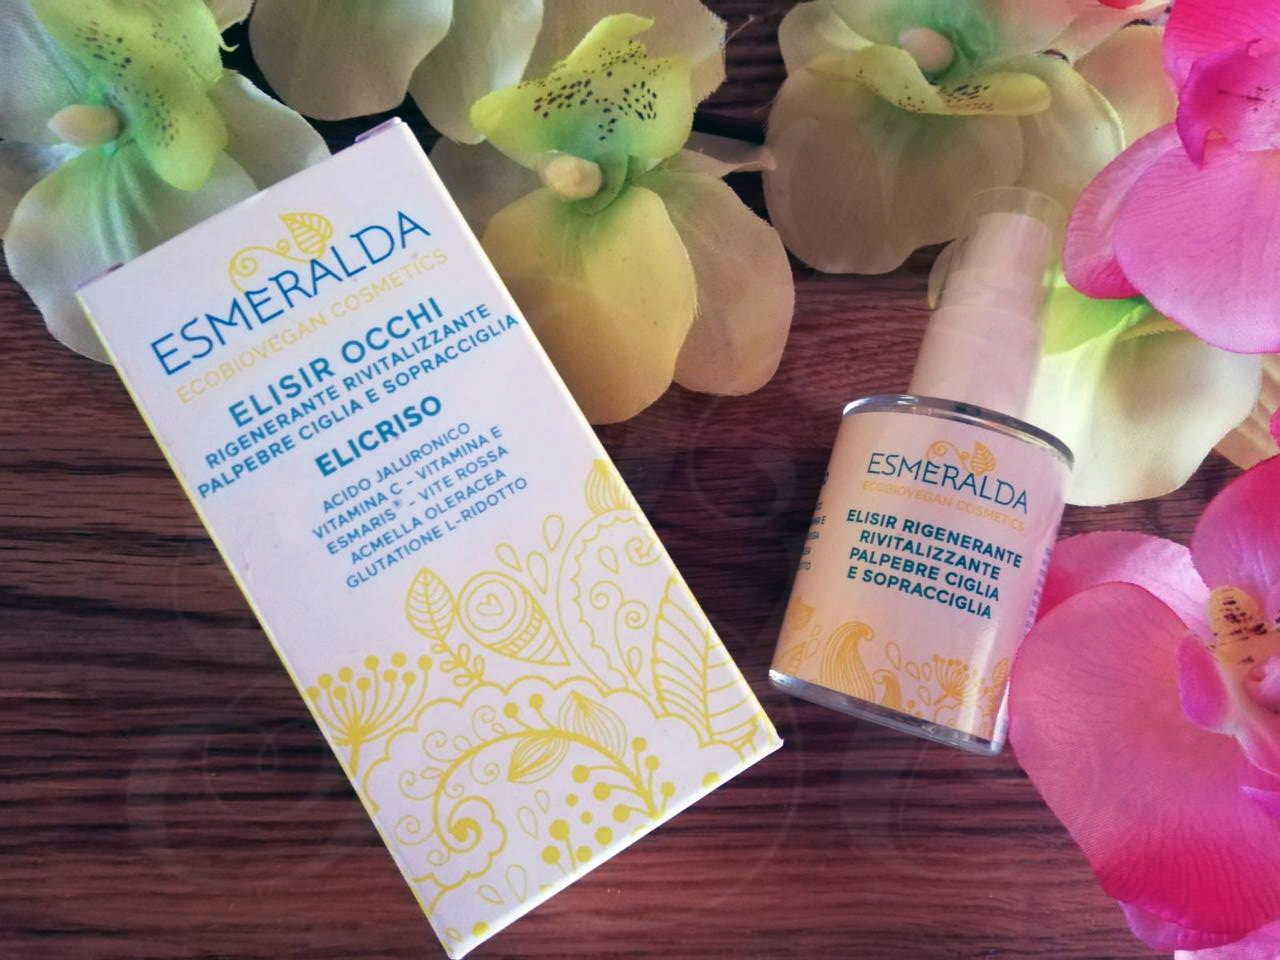 Esmeralda Cosmetics Elisir Occhi all'Elicrisio